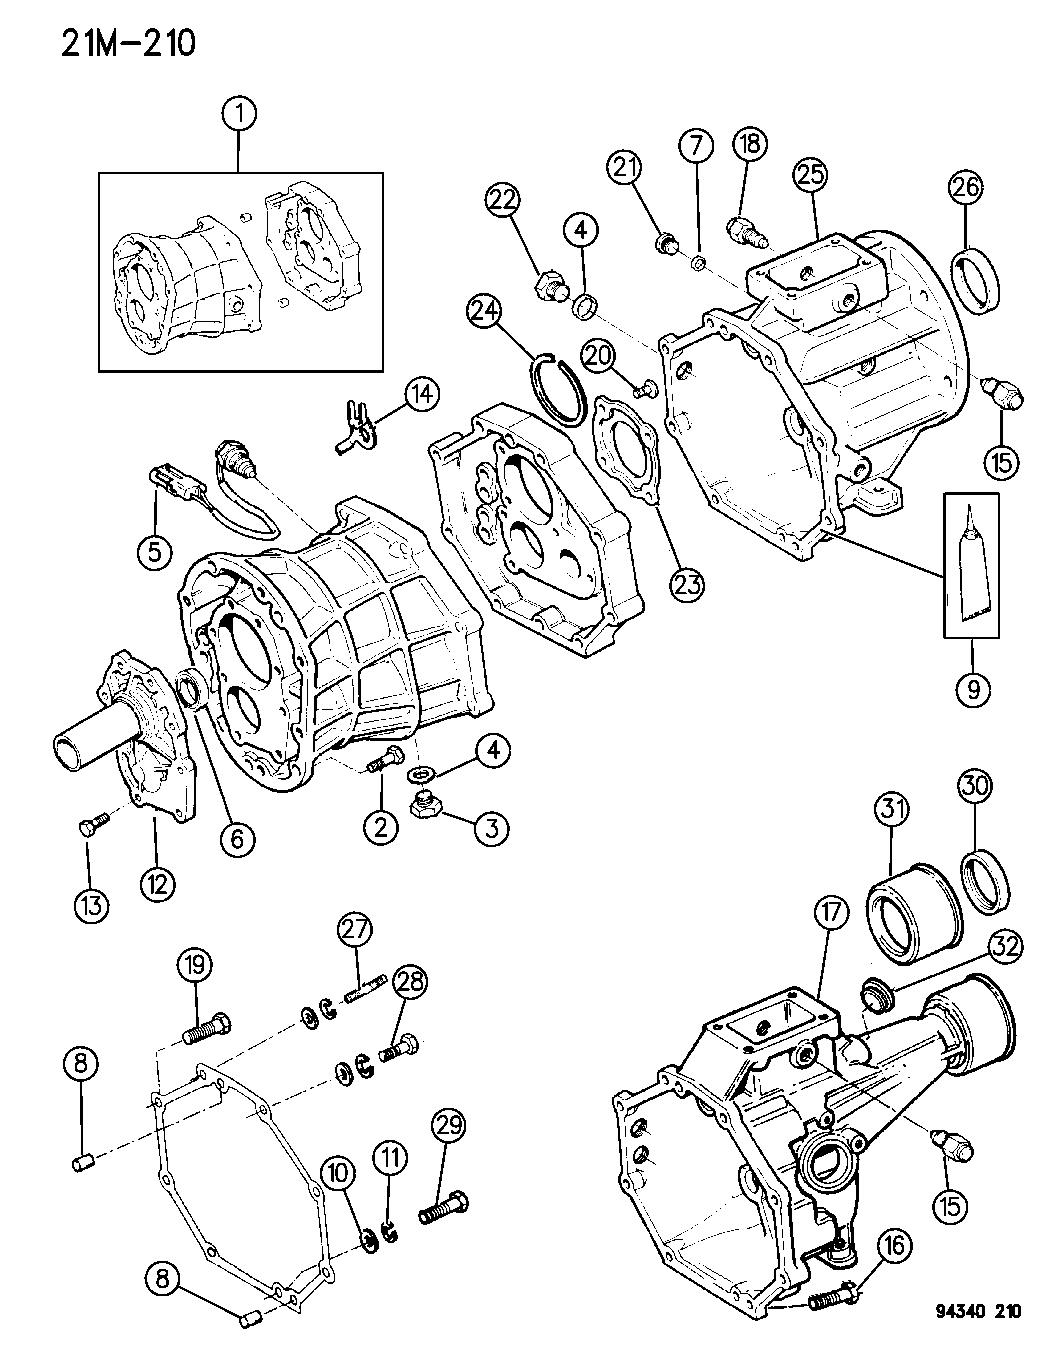 1996 dodge dakota manual transmission fluid